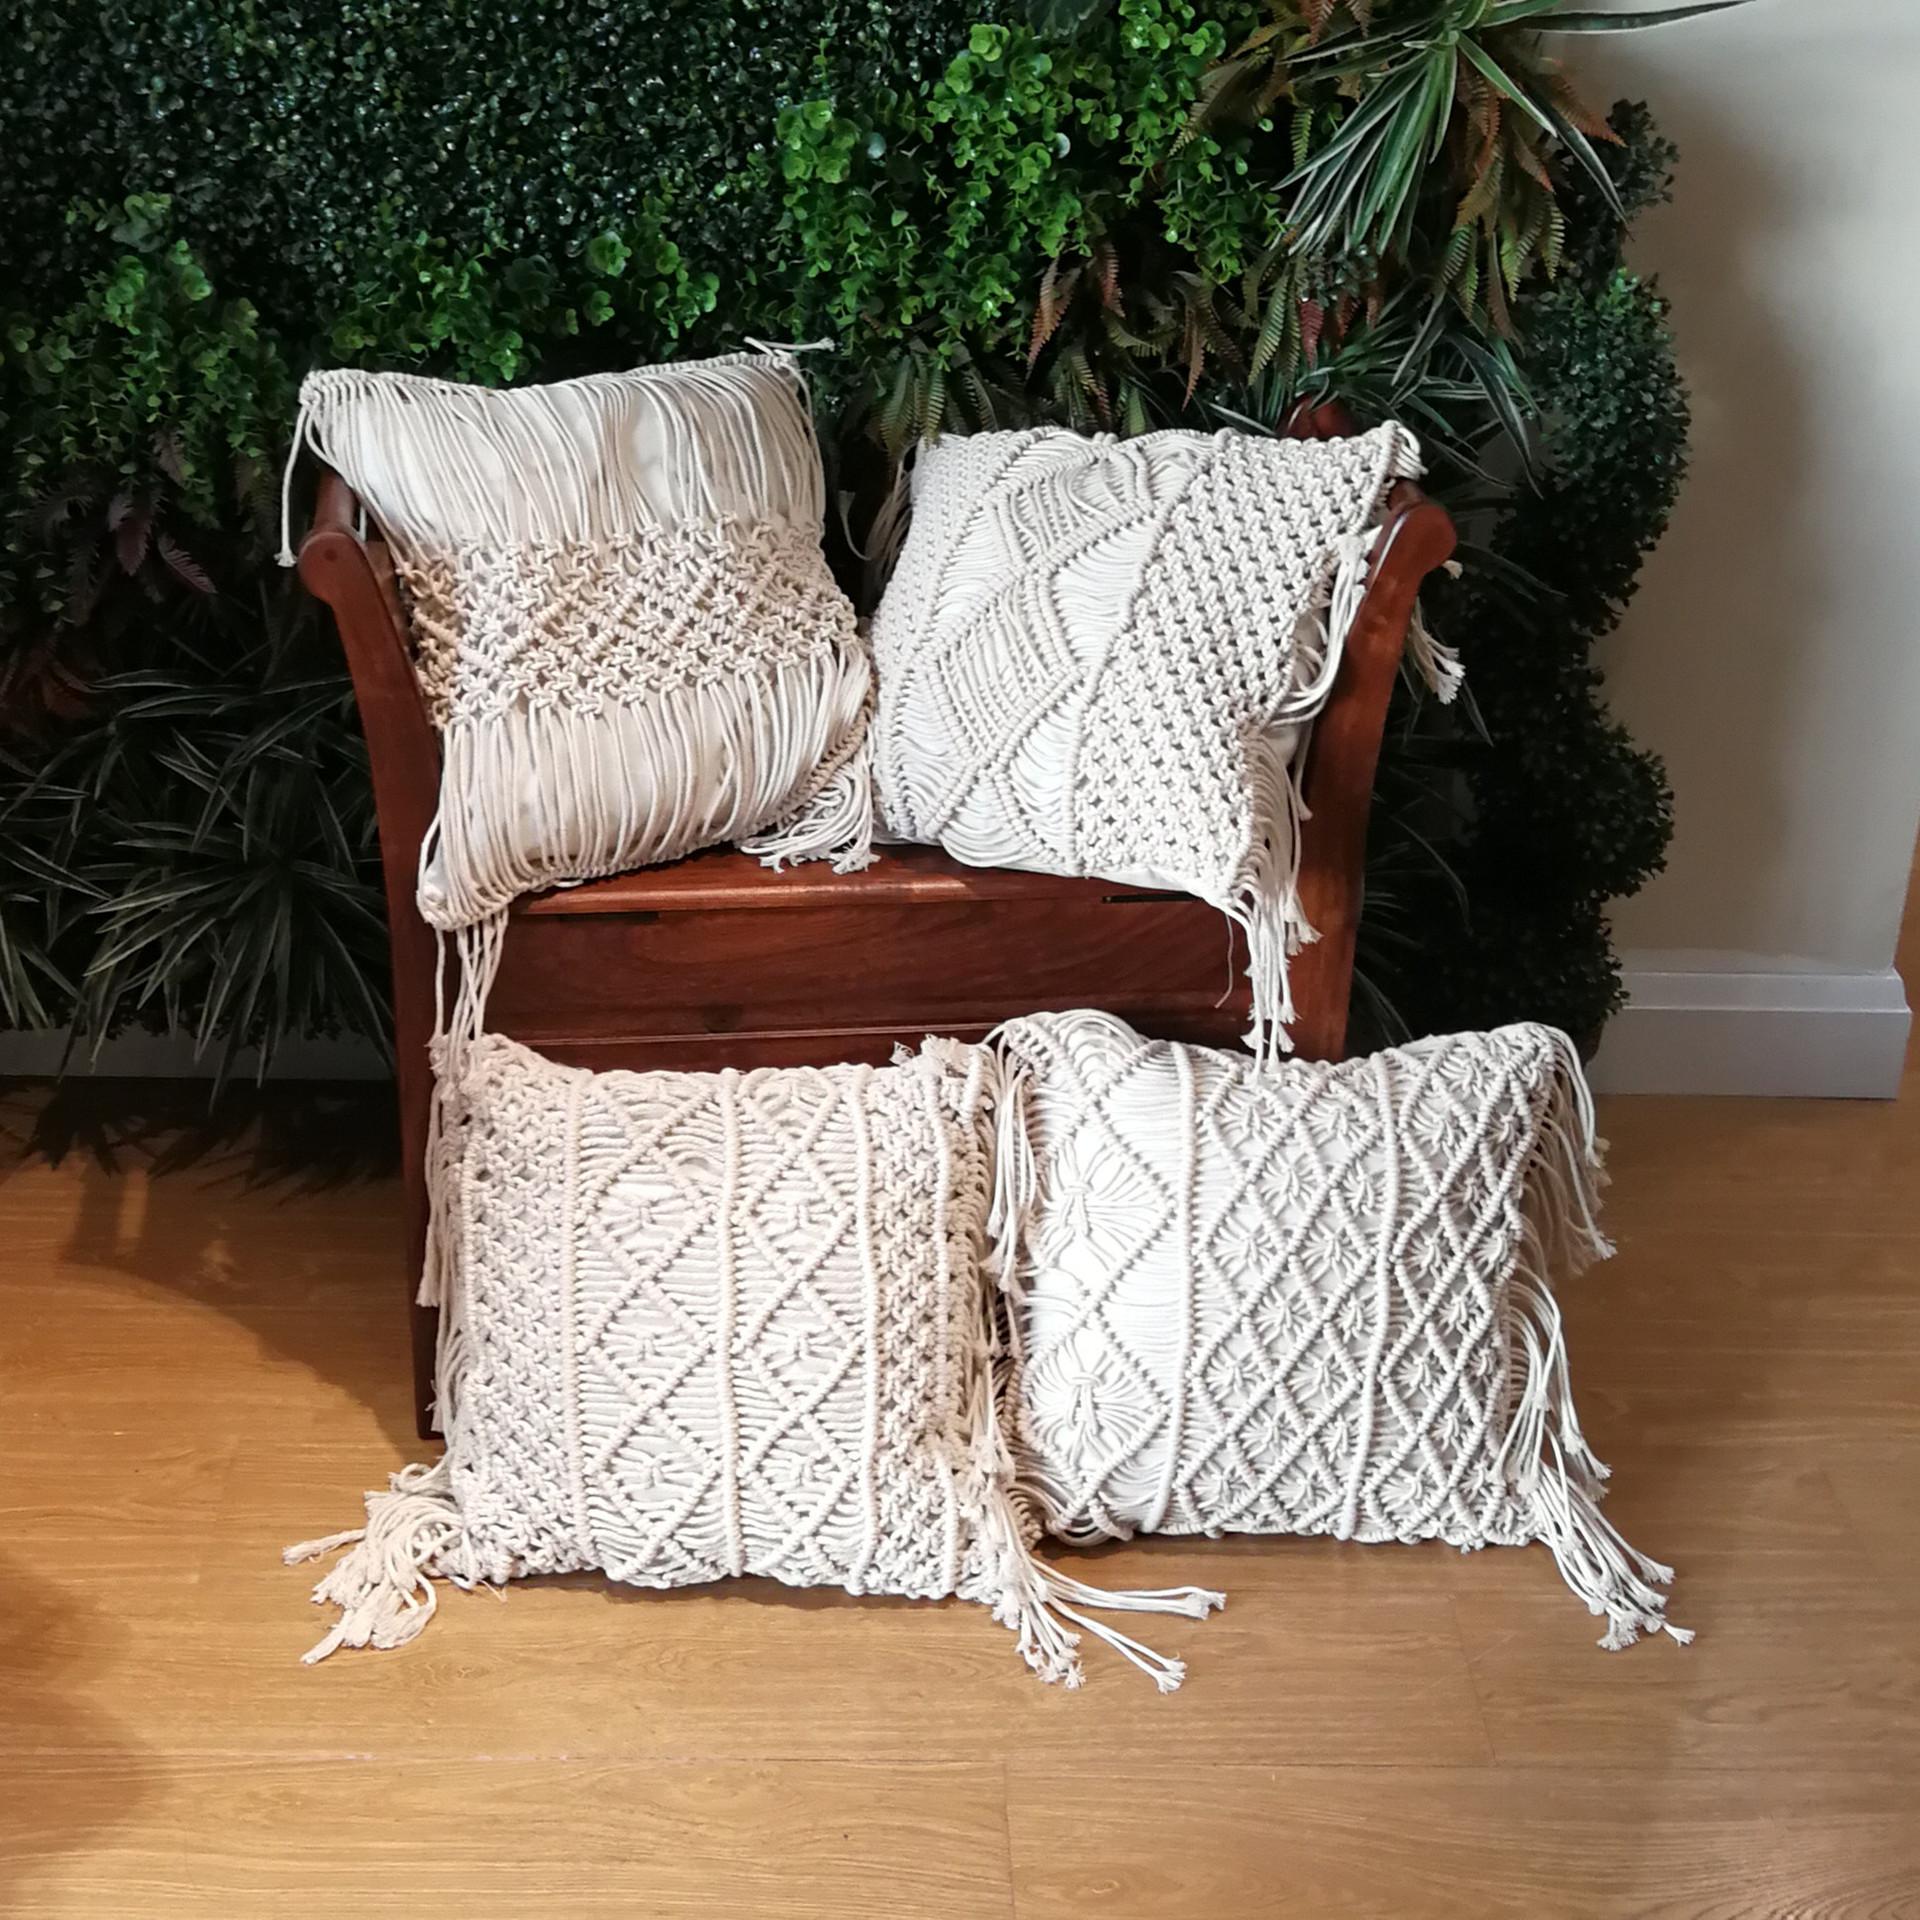 Hand Woven Bohemian Pillow for Living Room Sofa